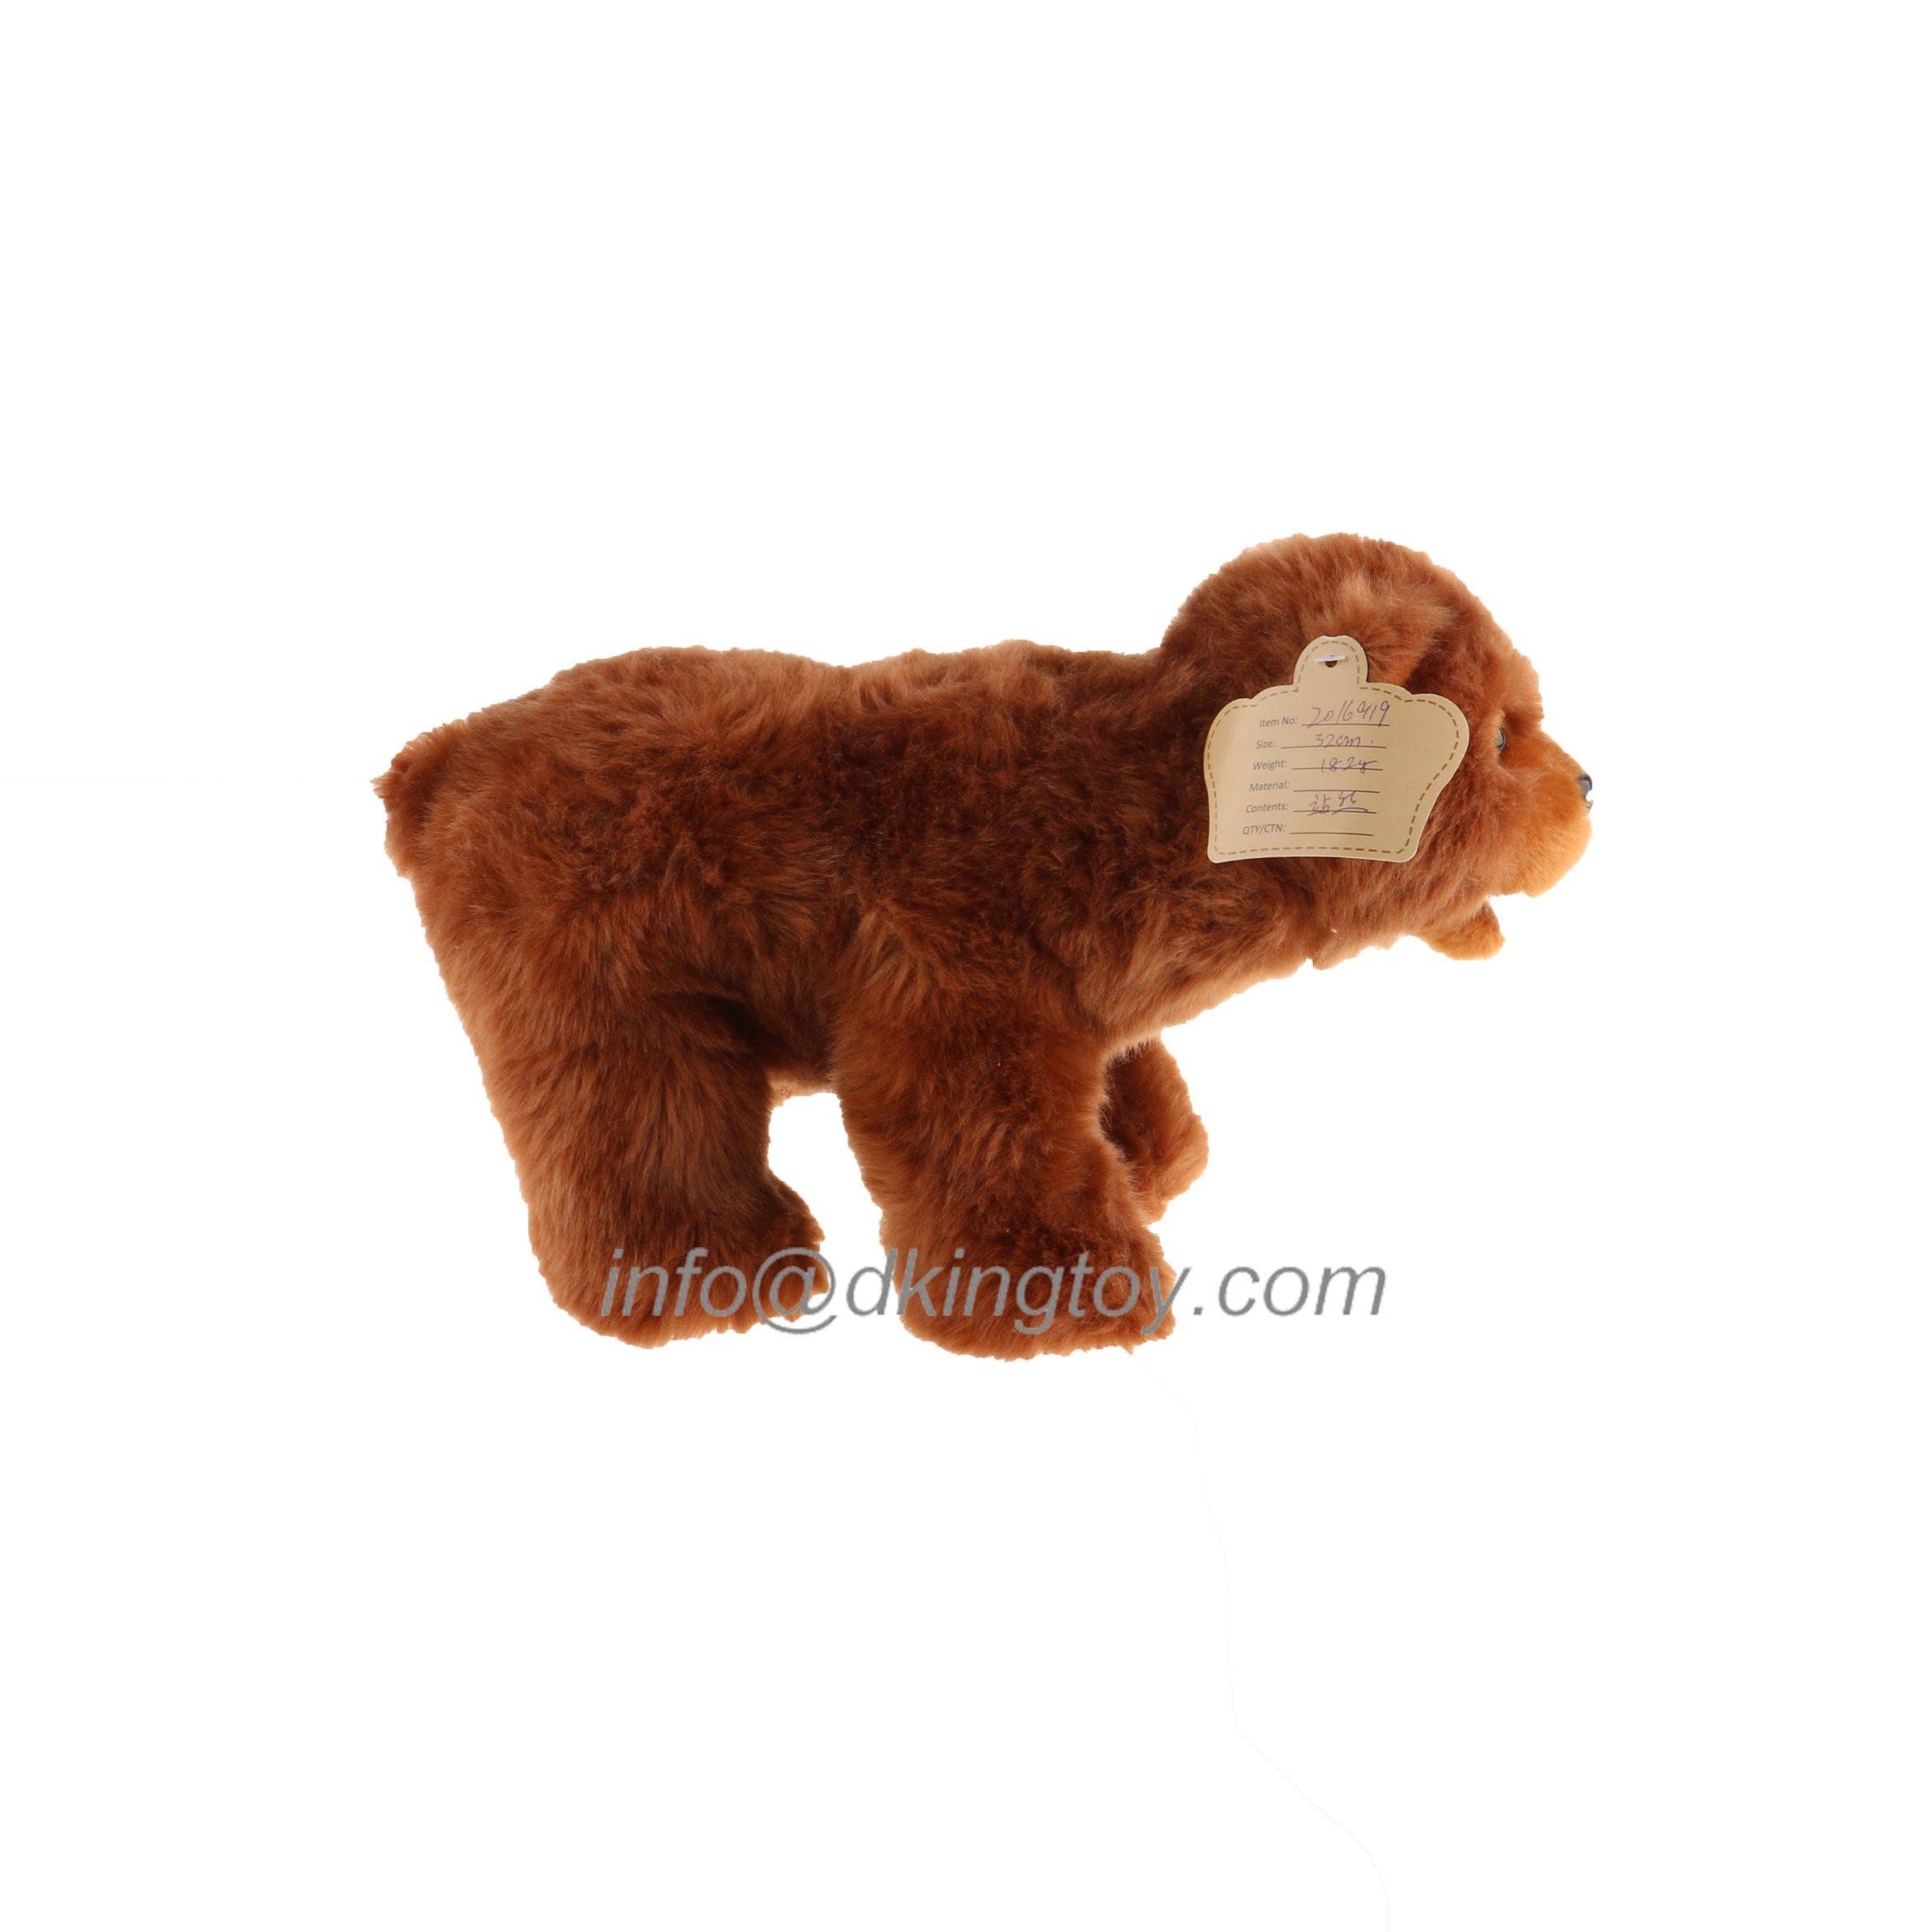 Plush Emulation Stuffed Bear Toy for Kids